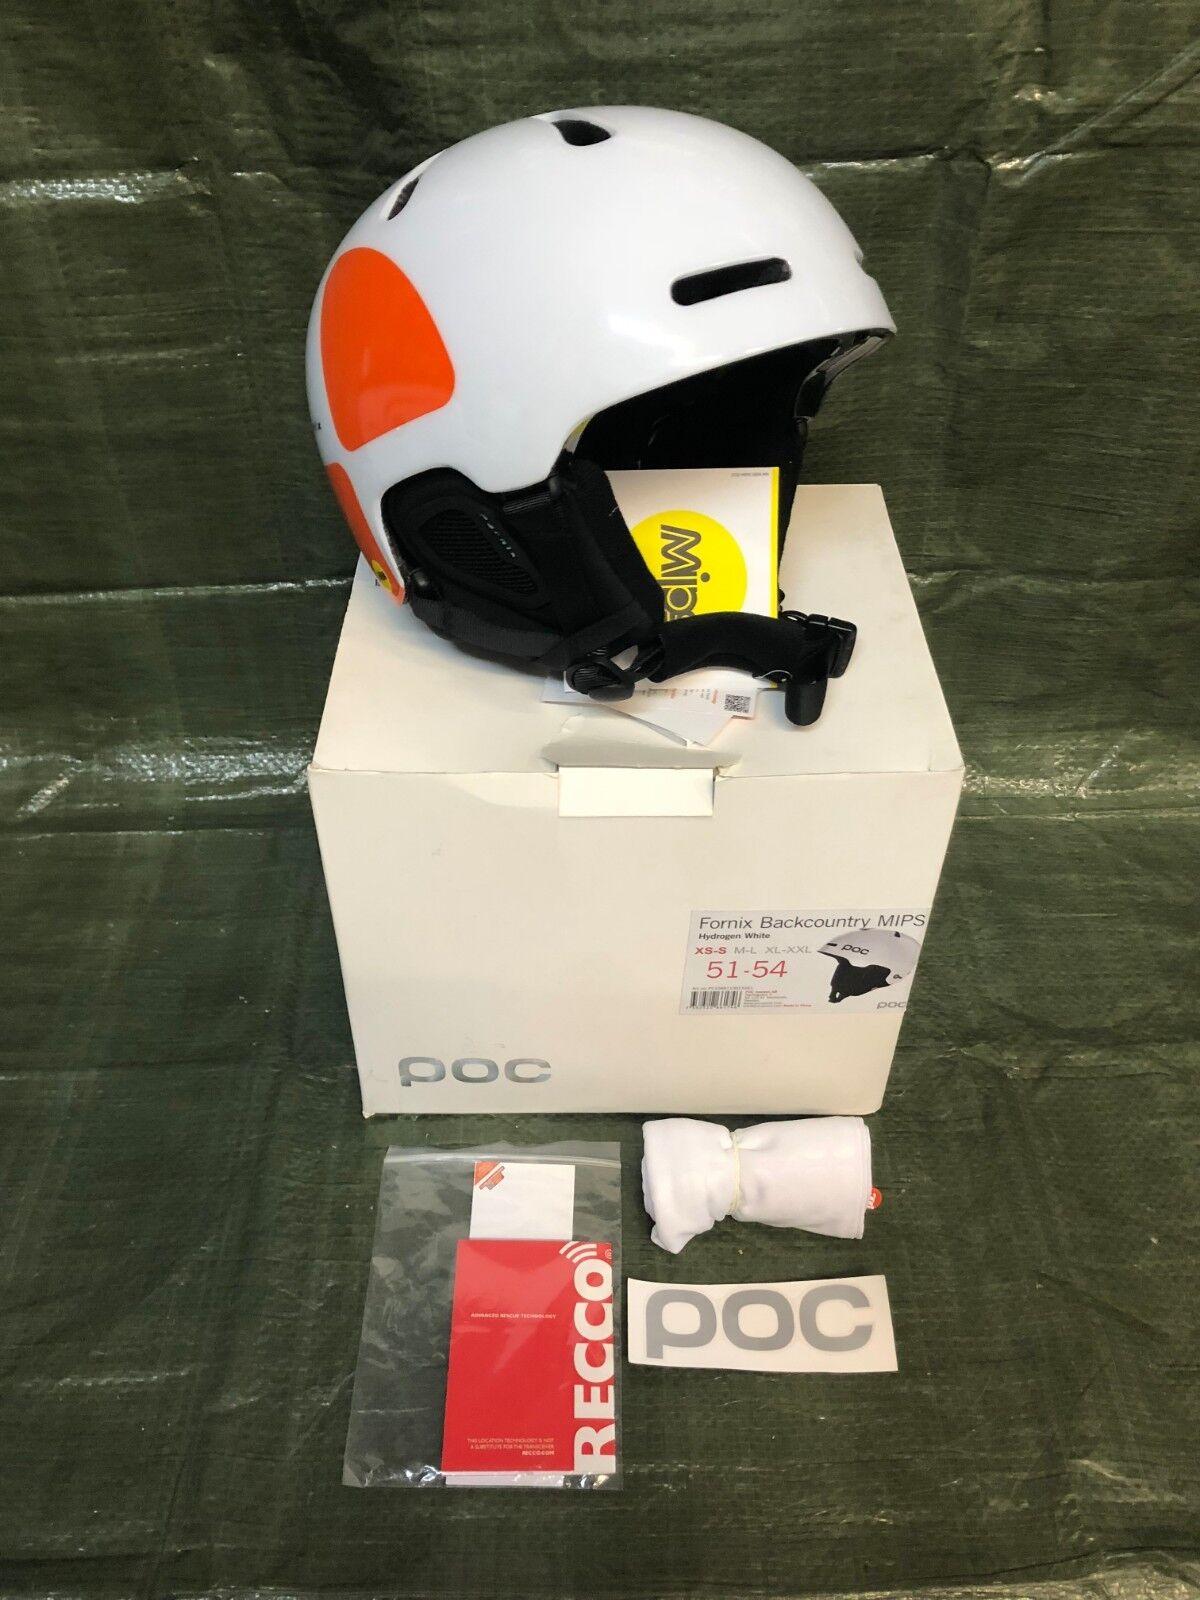 POC Fornix Backcountry MIPS Snowboardhelm Sicherheitshelm Gr. XS-S 51-54cm NR137